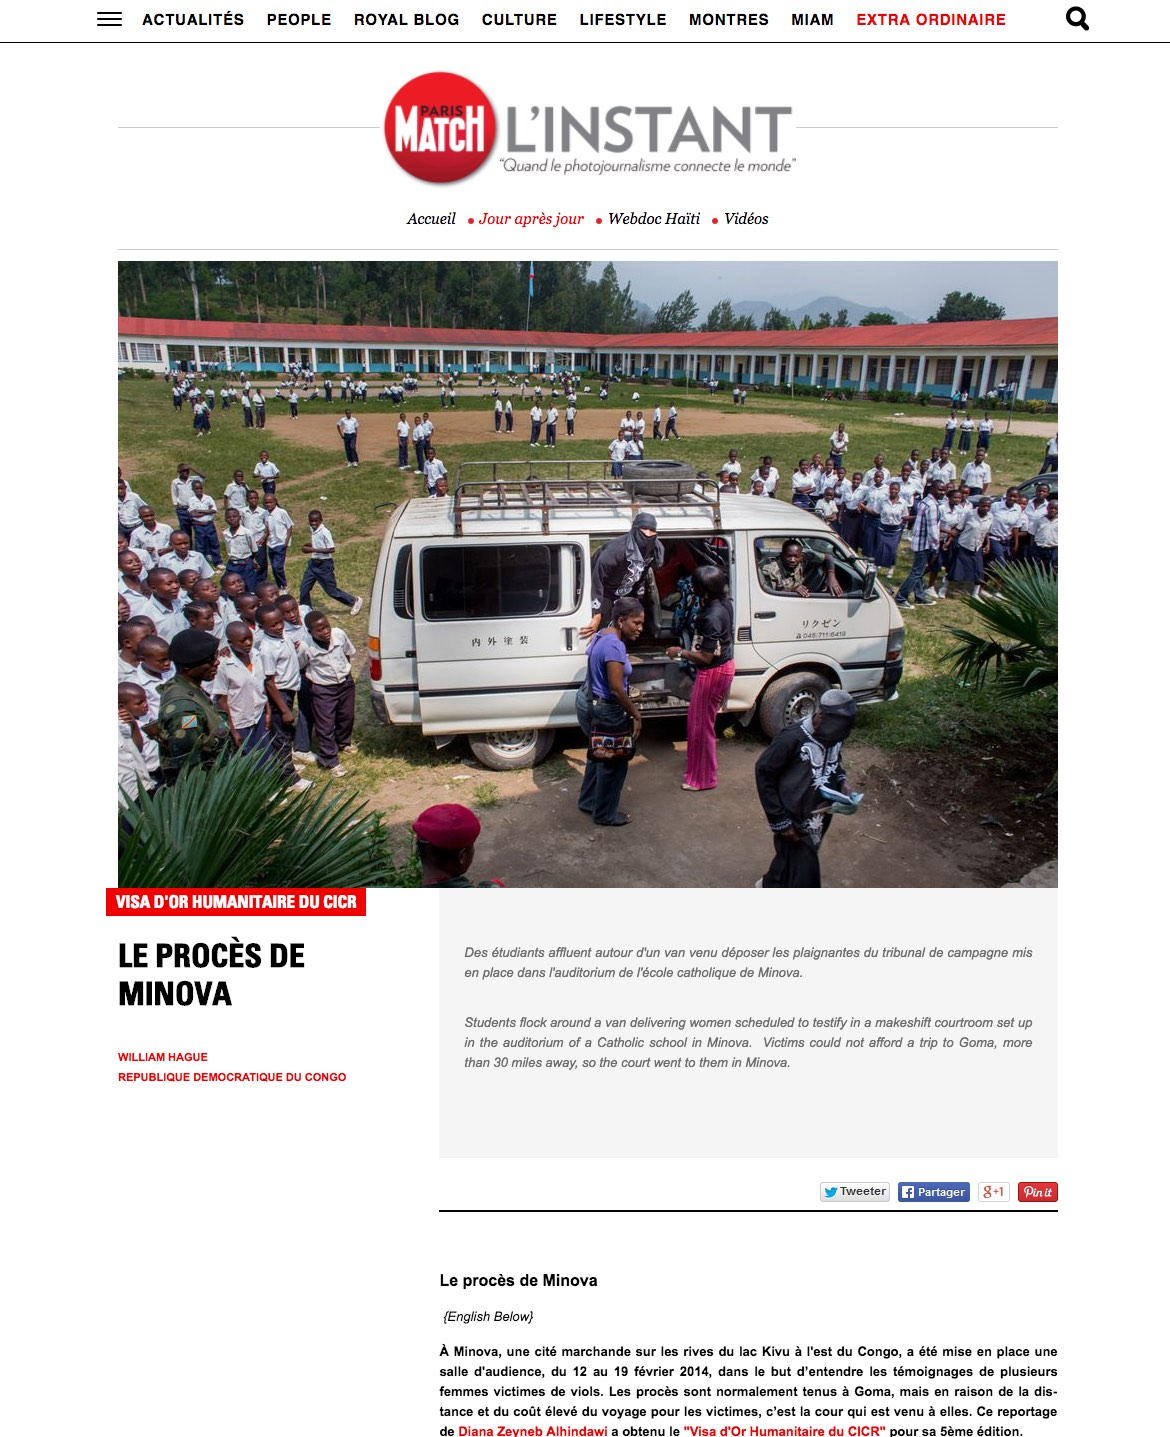 CLICK on title below to link to full article with slideshow     Le procès de Minova  (The Minova Trial) | L'Instant - Paris Match,Jul 2015